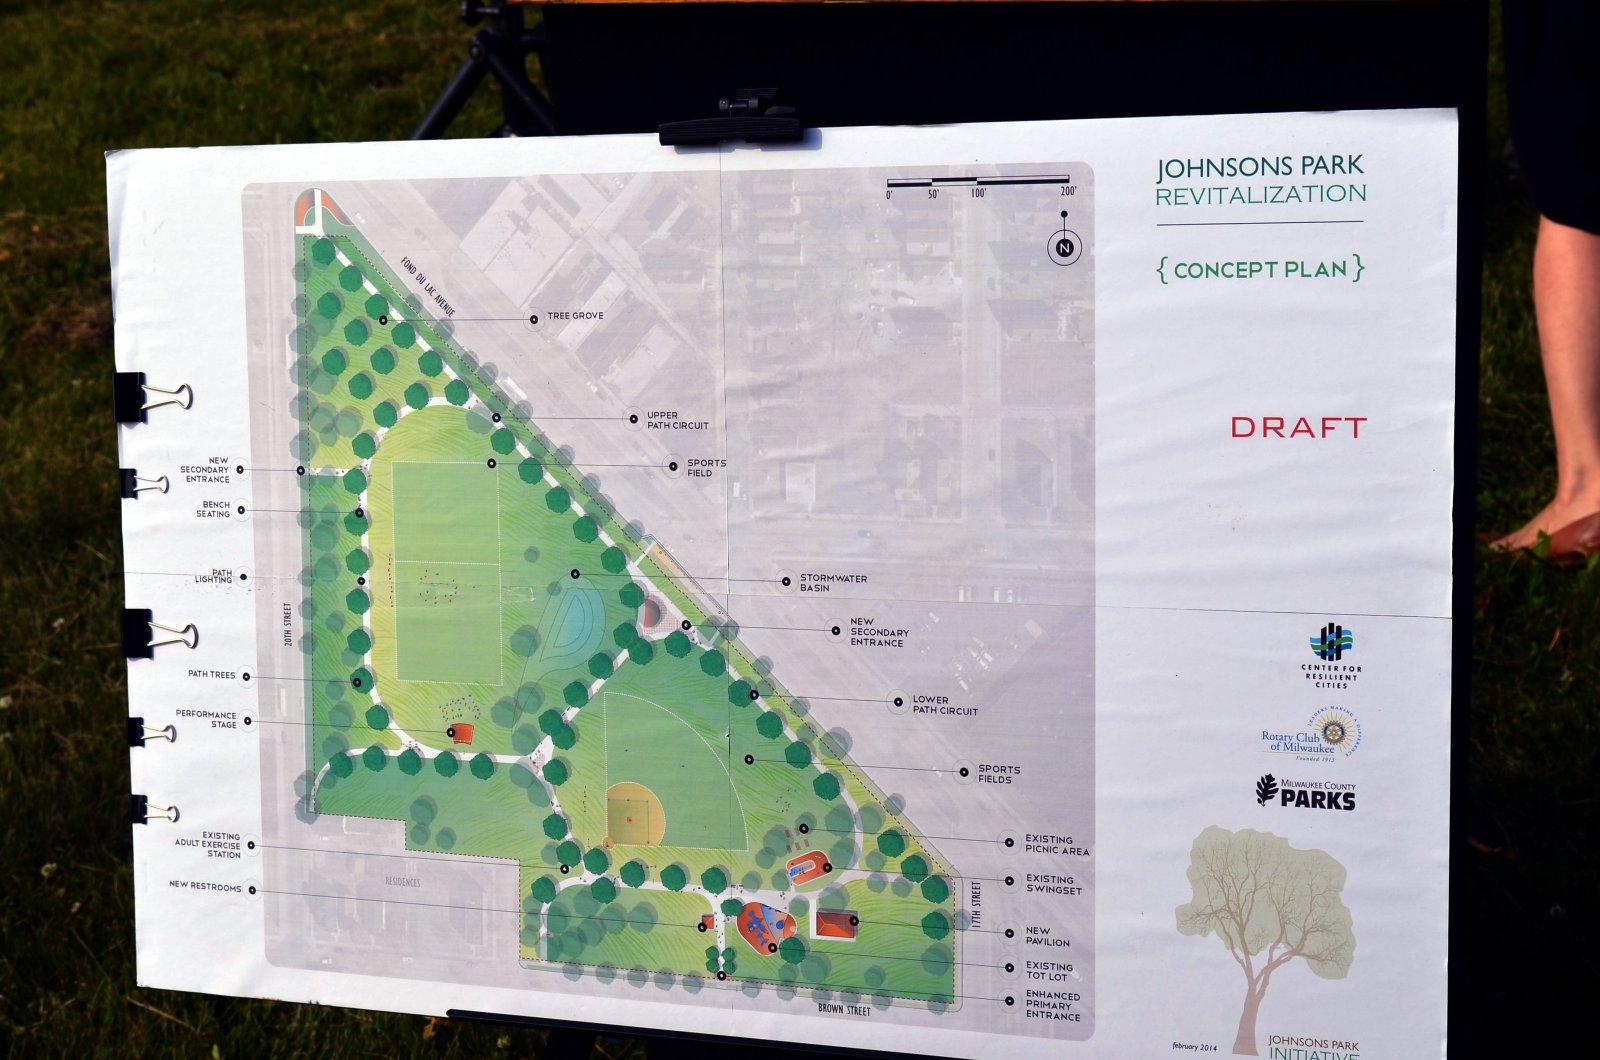 Johnsons Park Plan